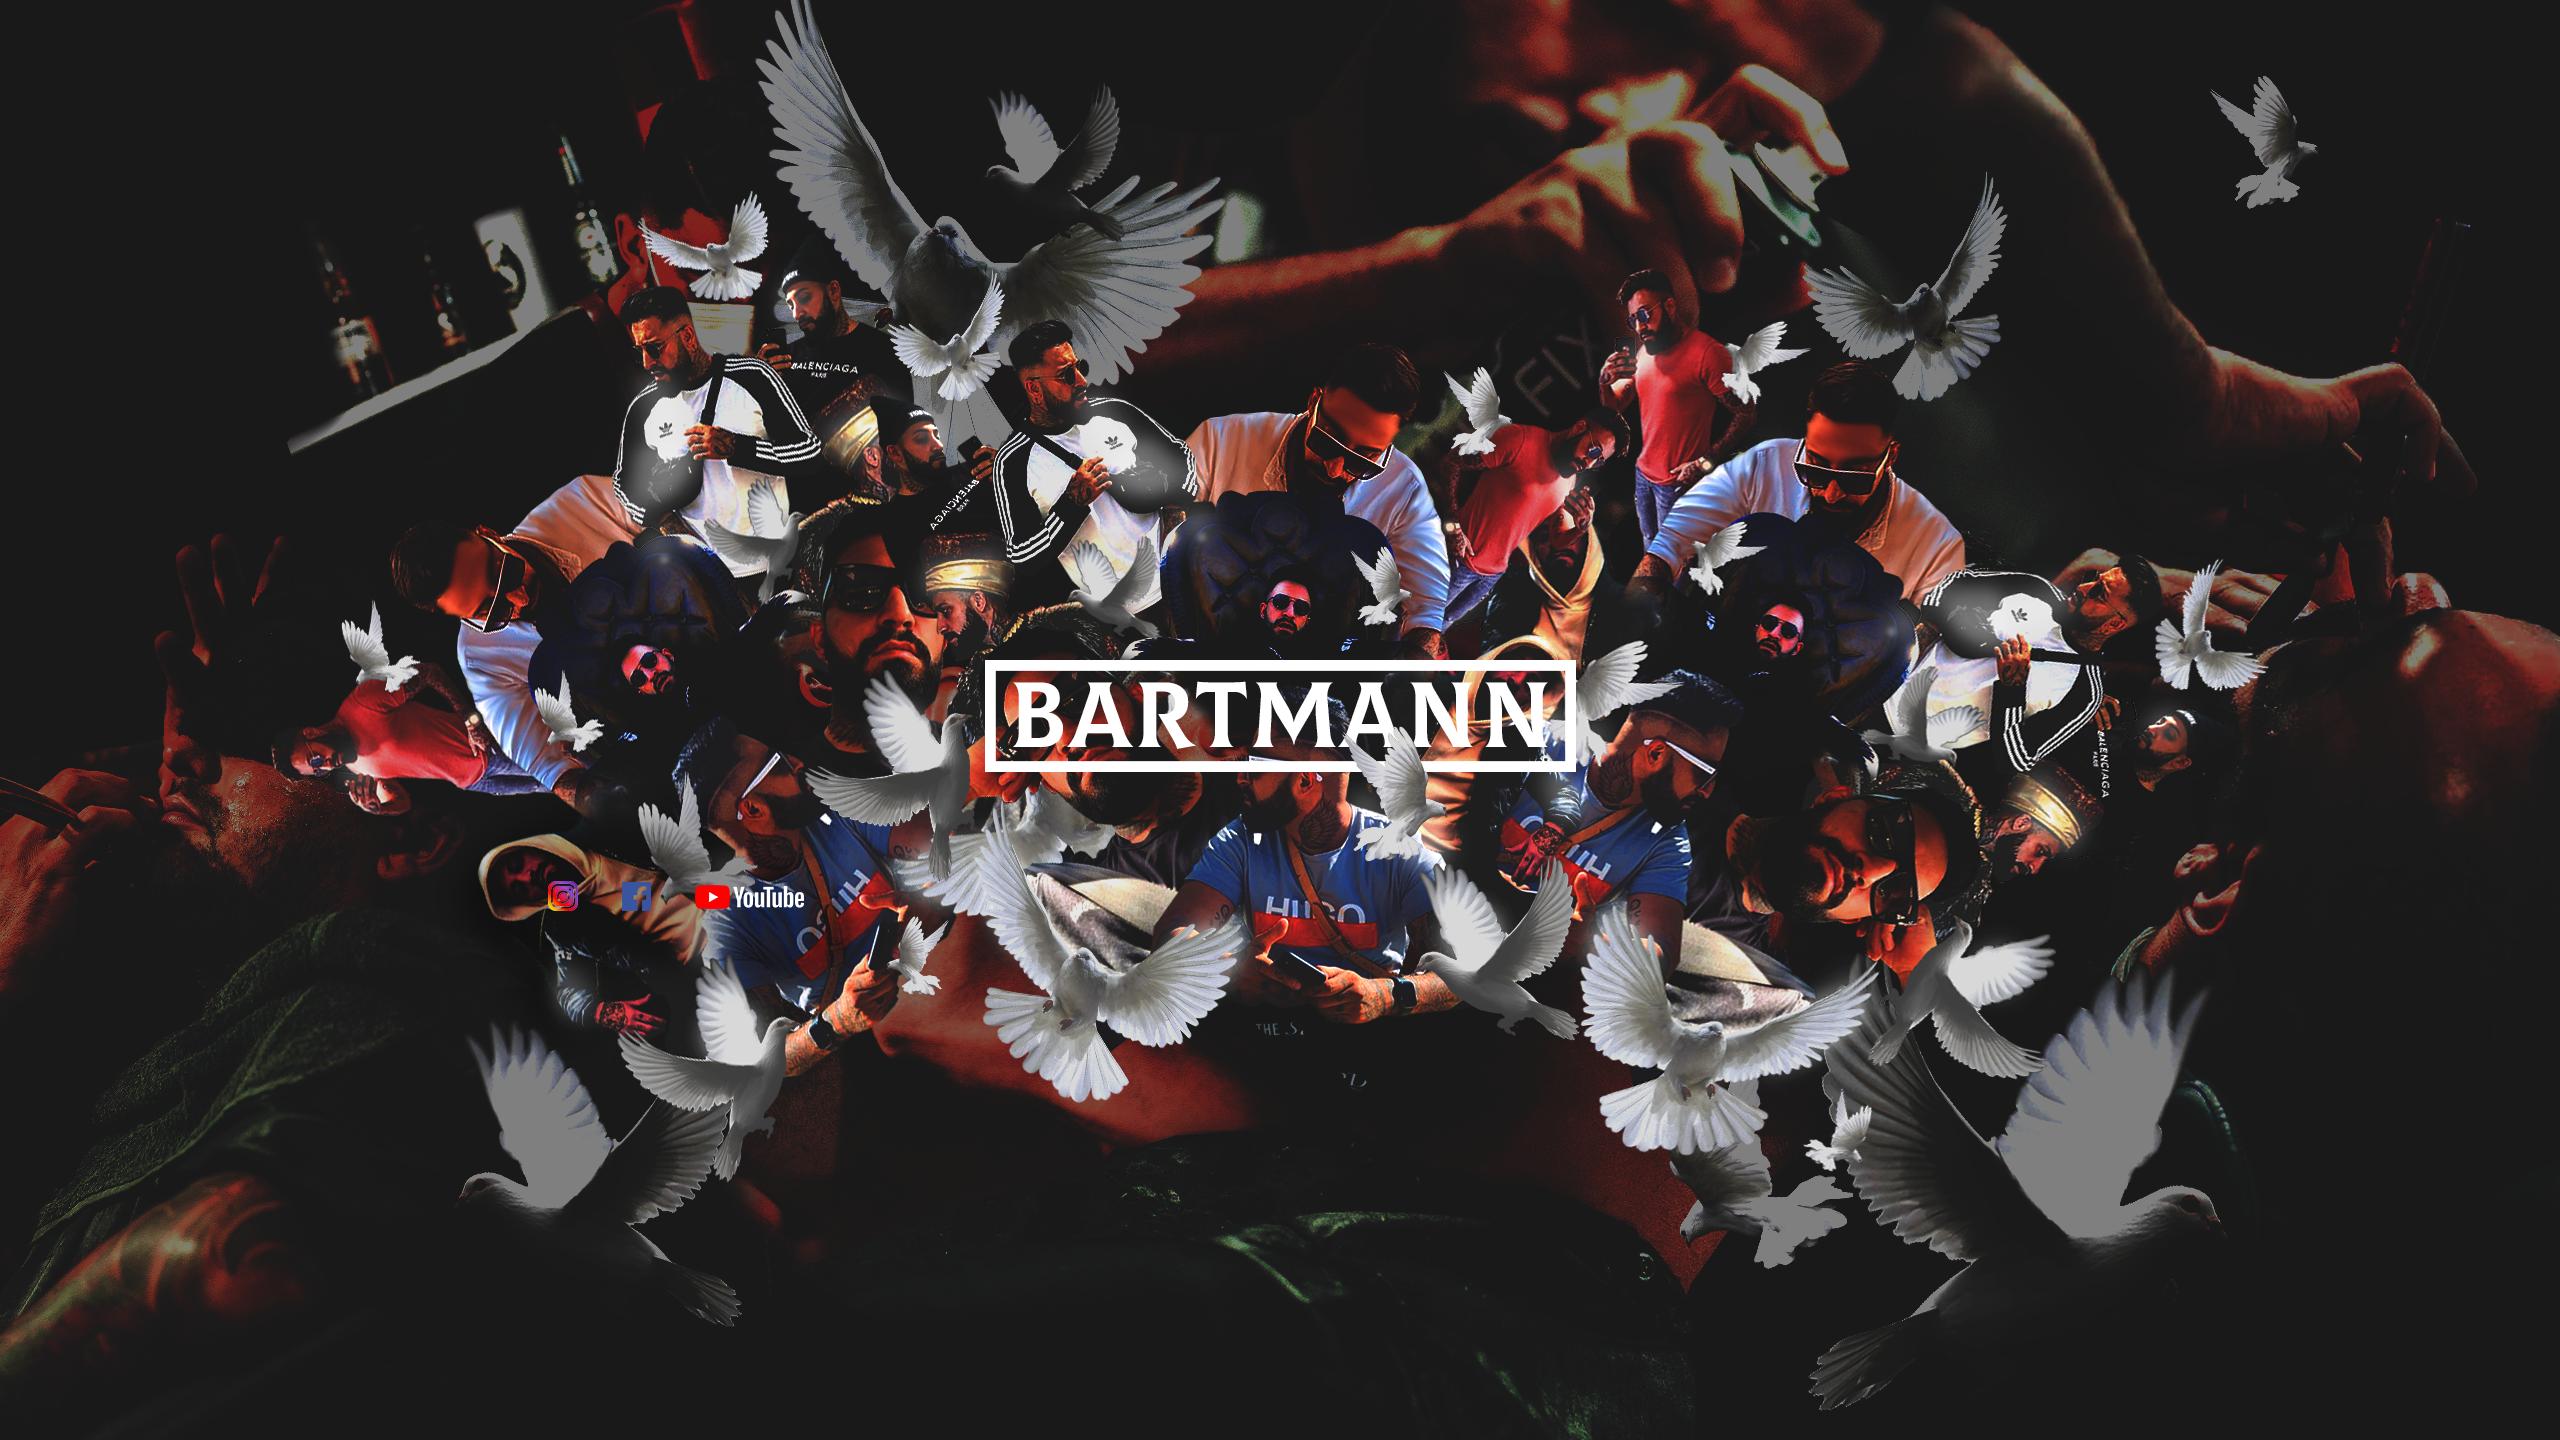 YouTube BANNER - BARTMANN